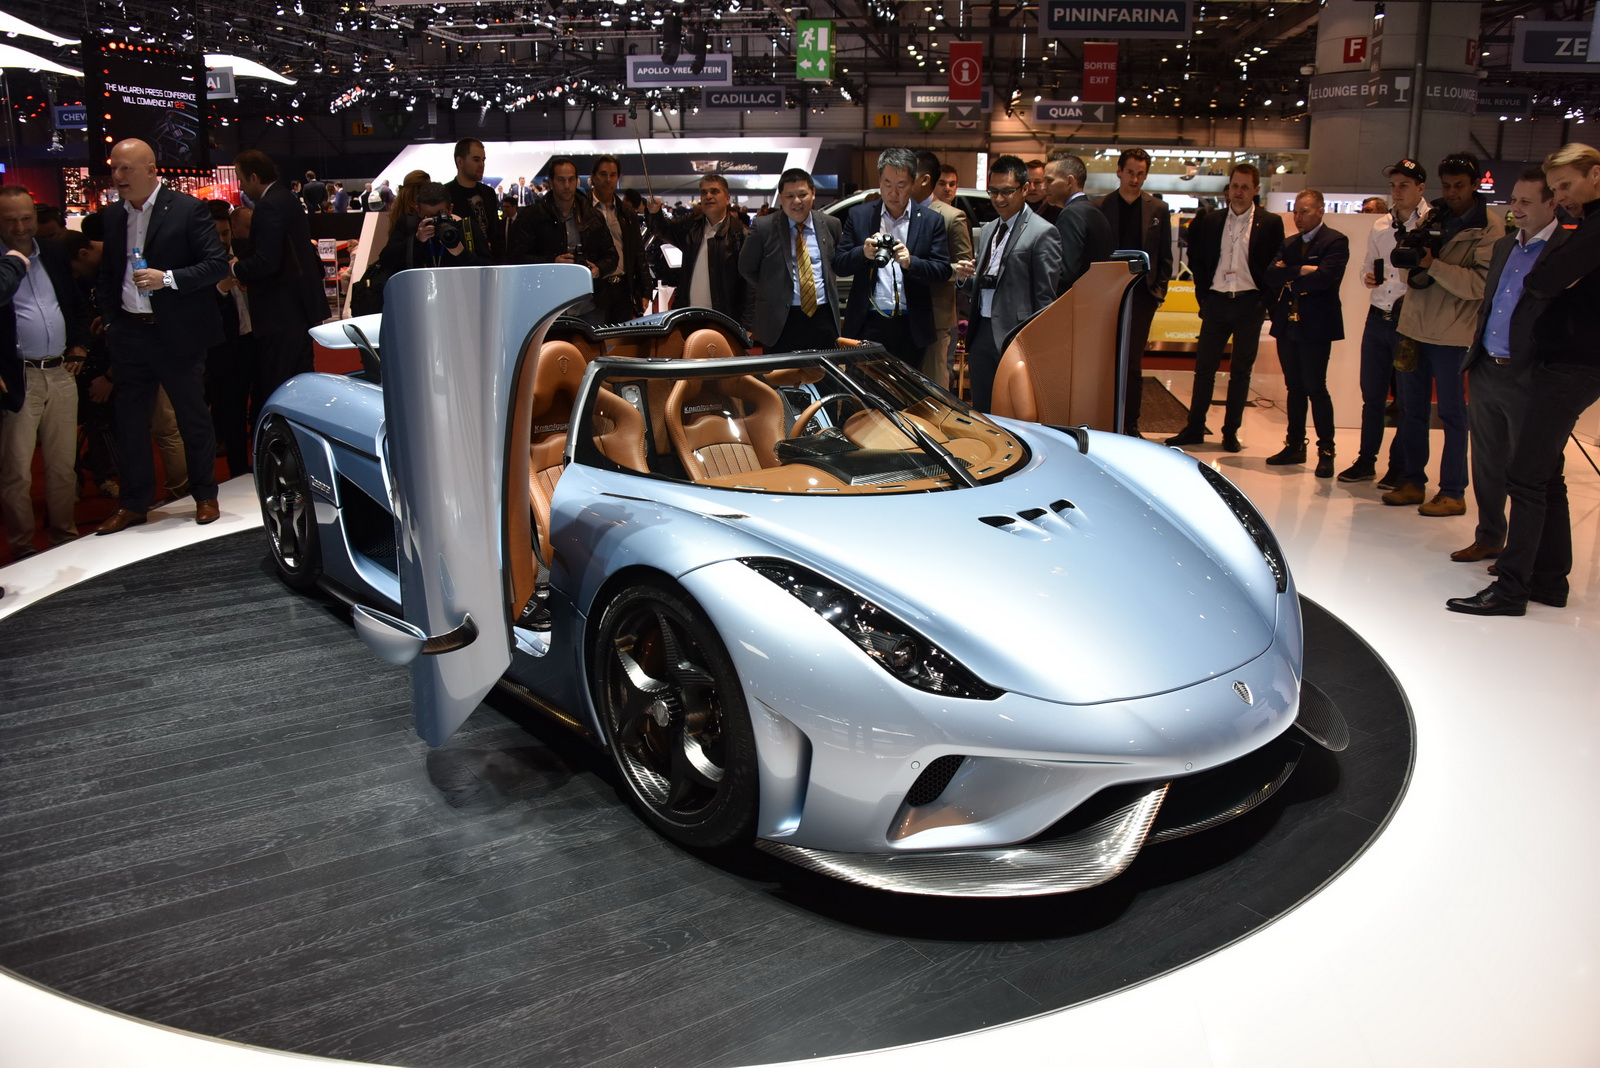 Koenigsegg Regera: Phá vỡ mọi giới hạn